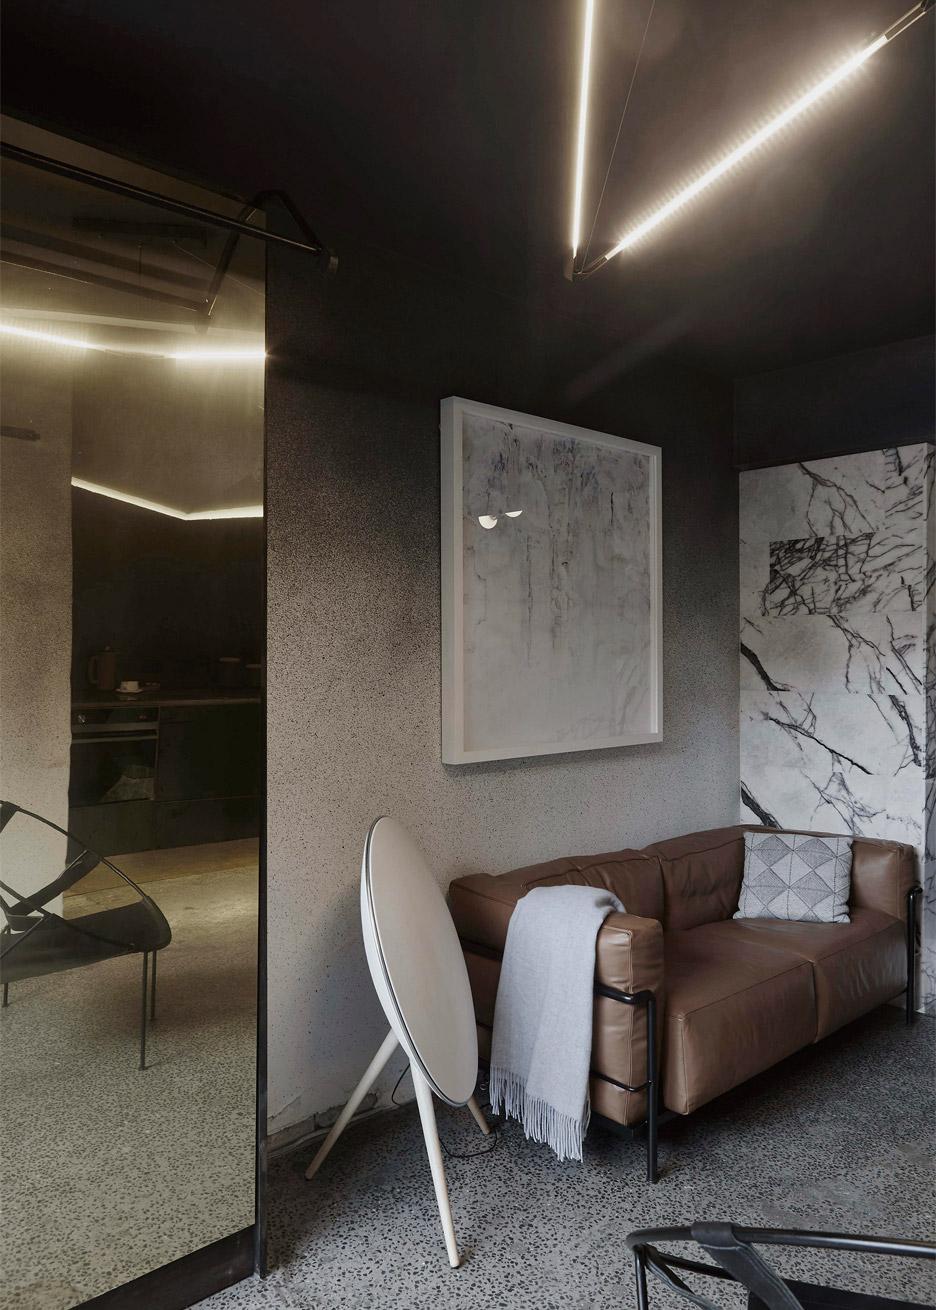 microlux-melbourne-australia-apartment-interior-design-edwards-moore_dezeen_936_5.jpg